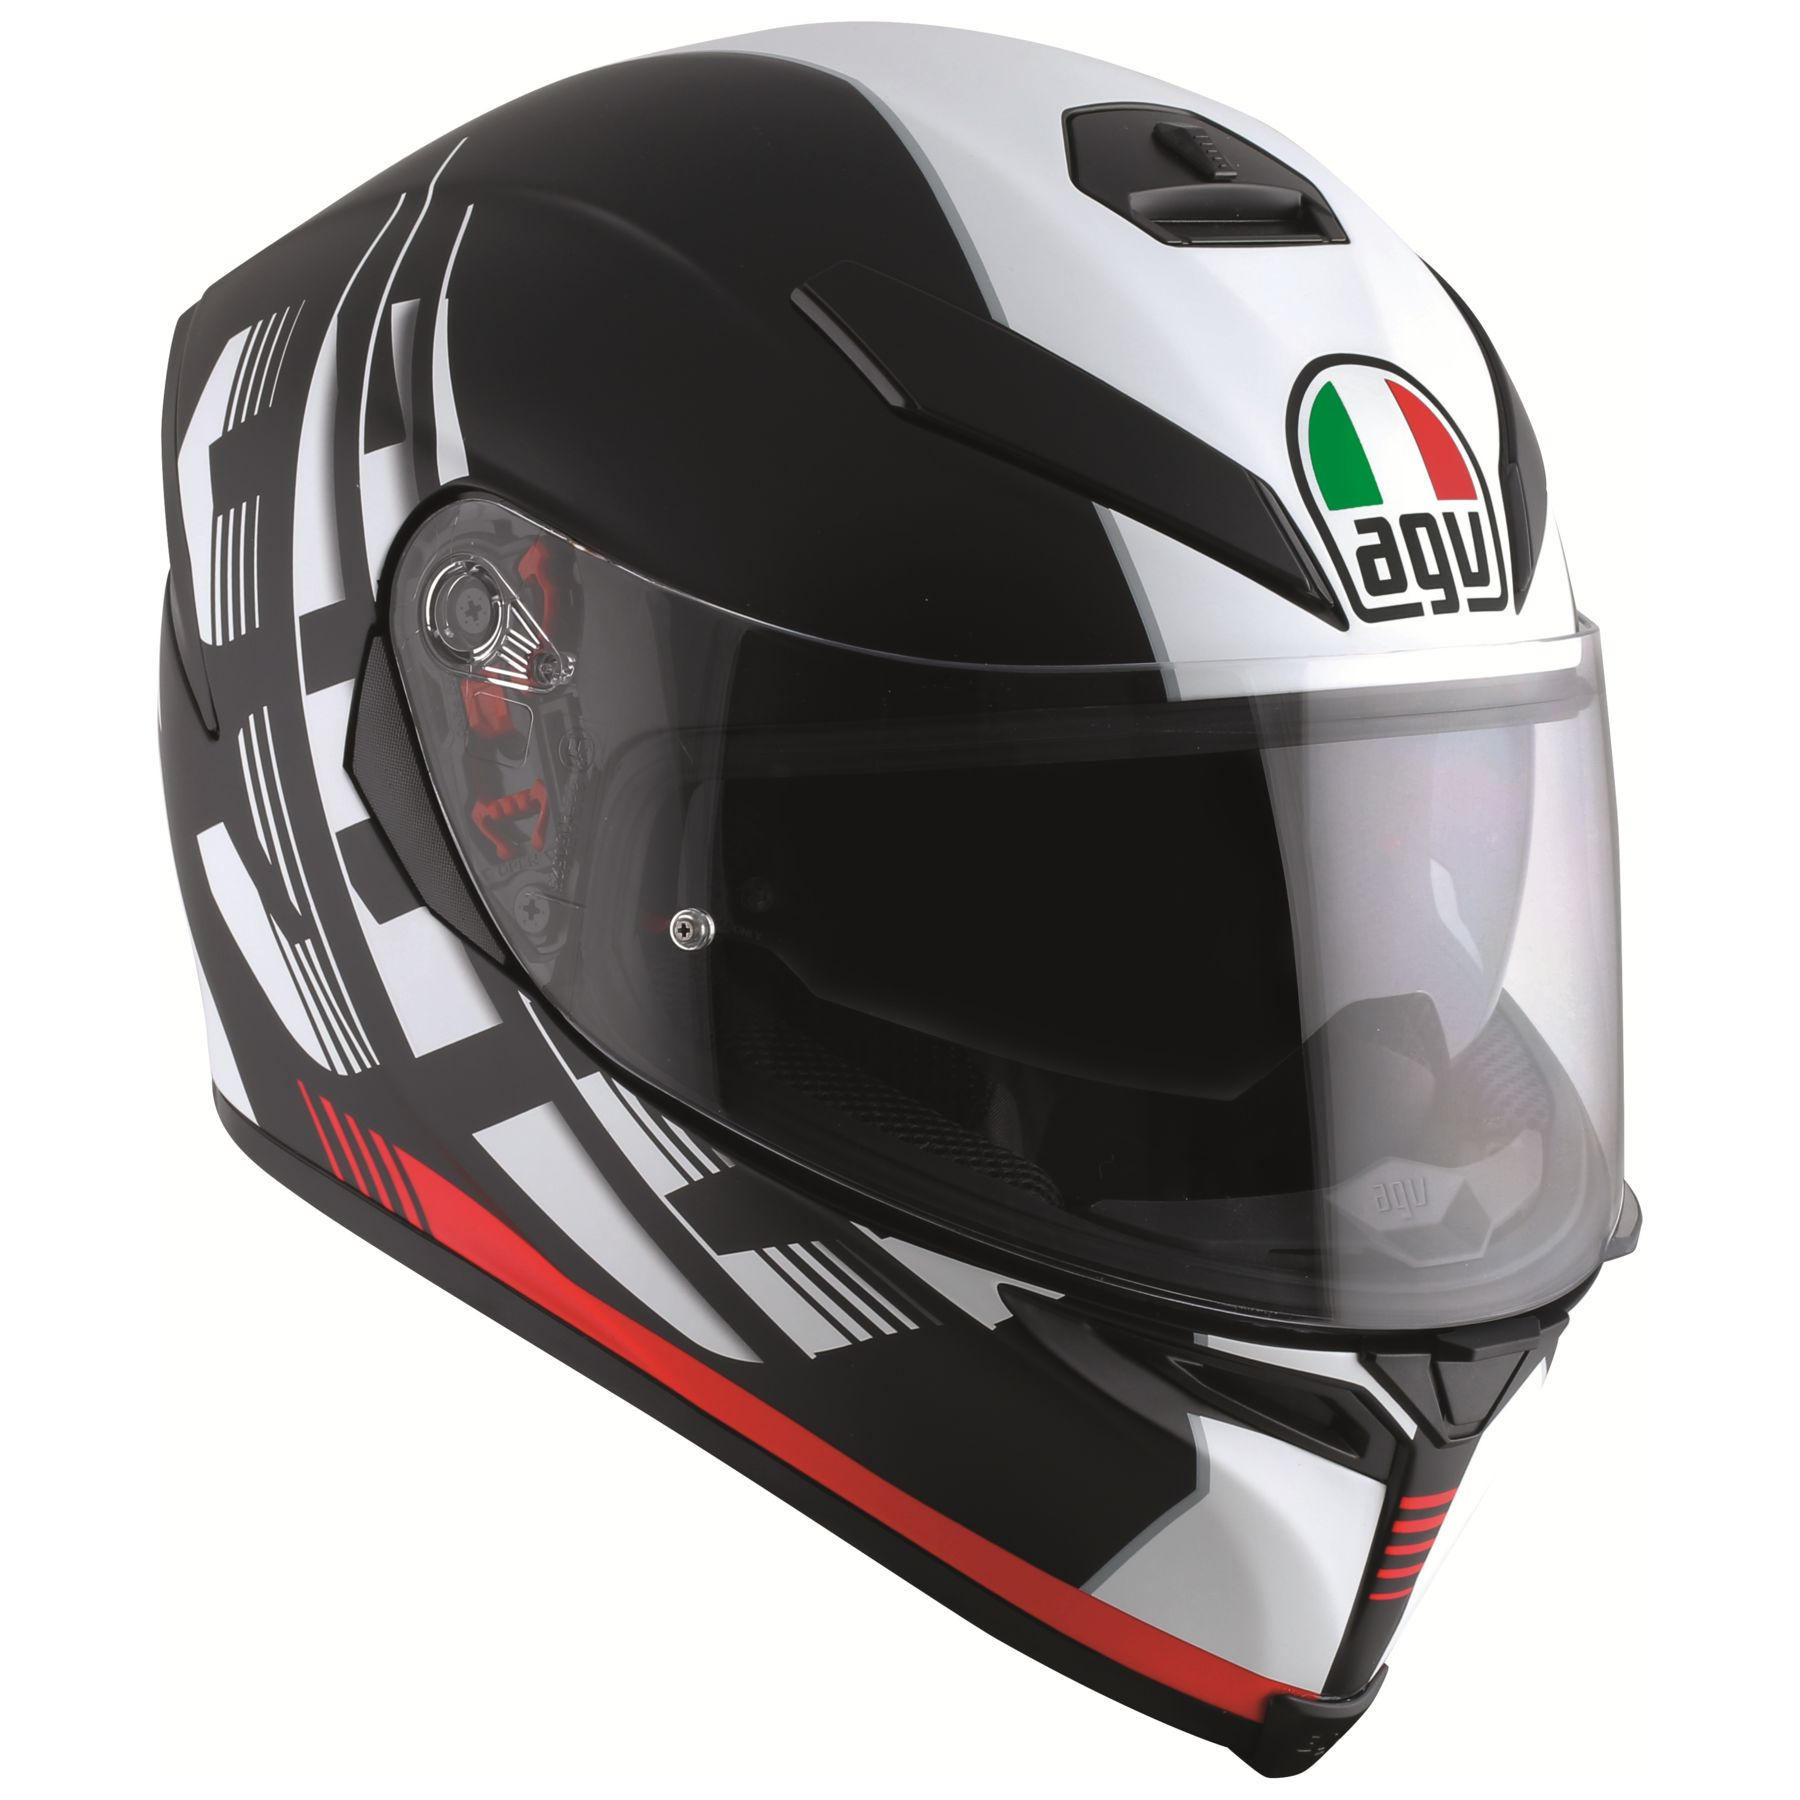 Medium-Small AGV Replacement CHEEKPADS for AGV K5 Helmet MS